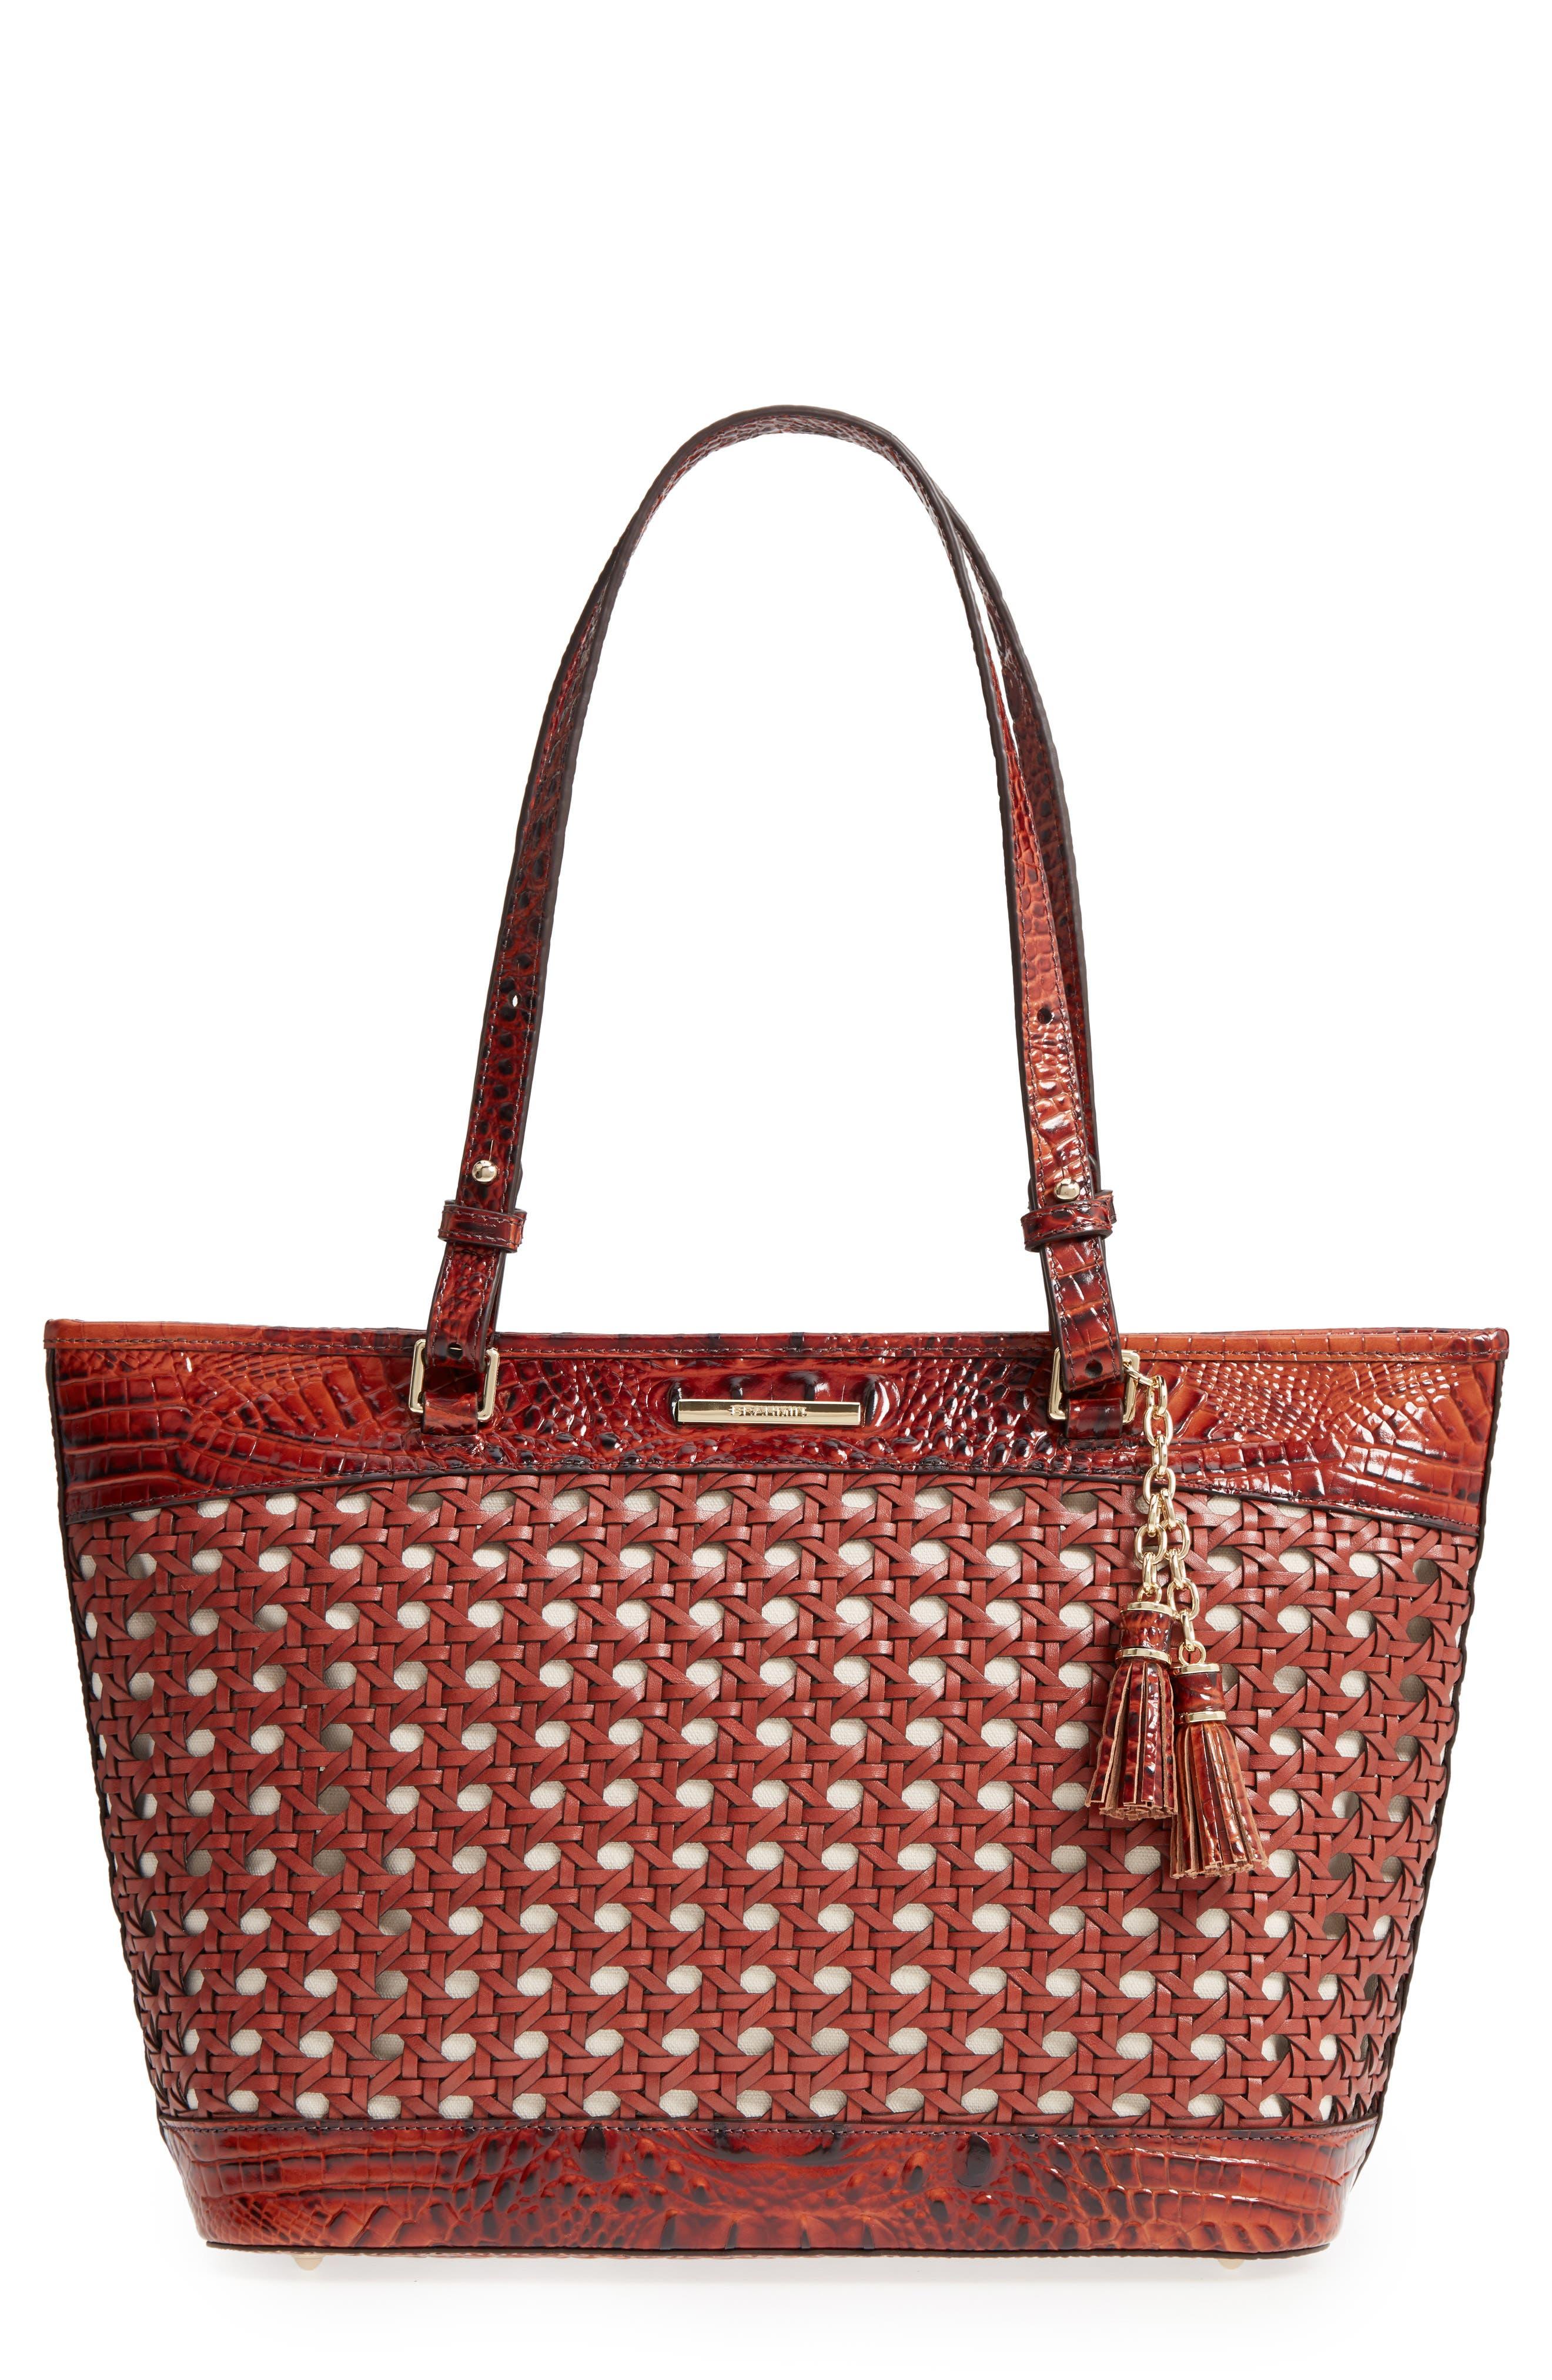 Medium Asher Leather Tote Bag,                             Main thumbnail 1, color,                             Pecan